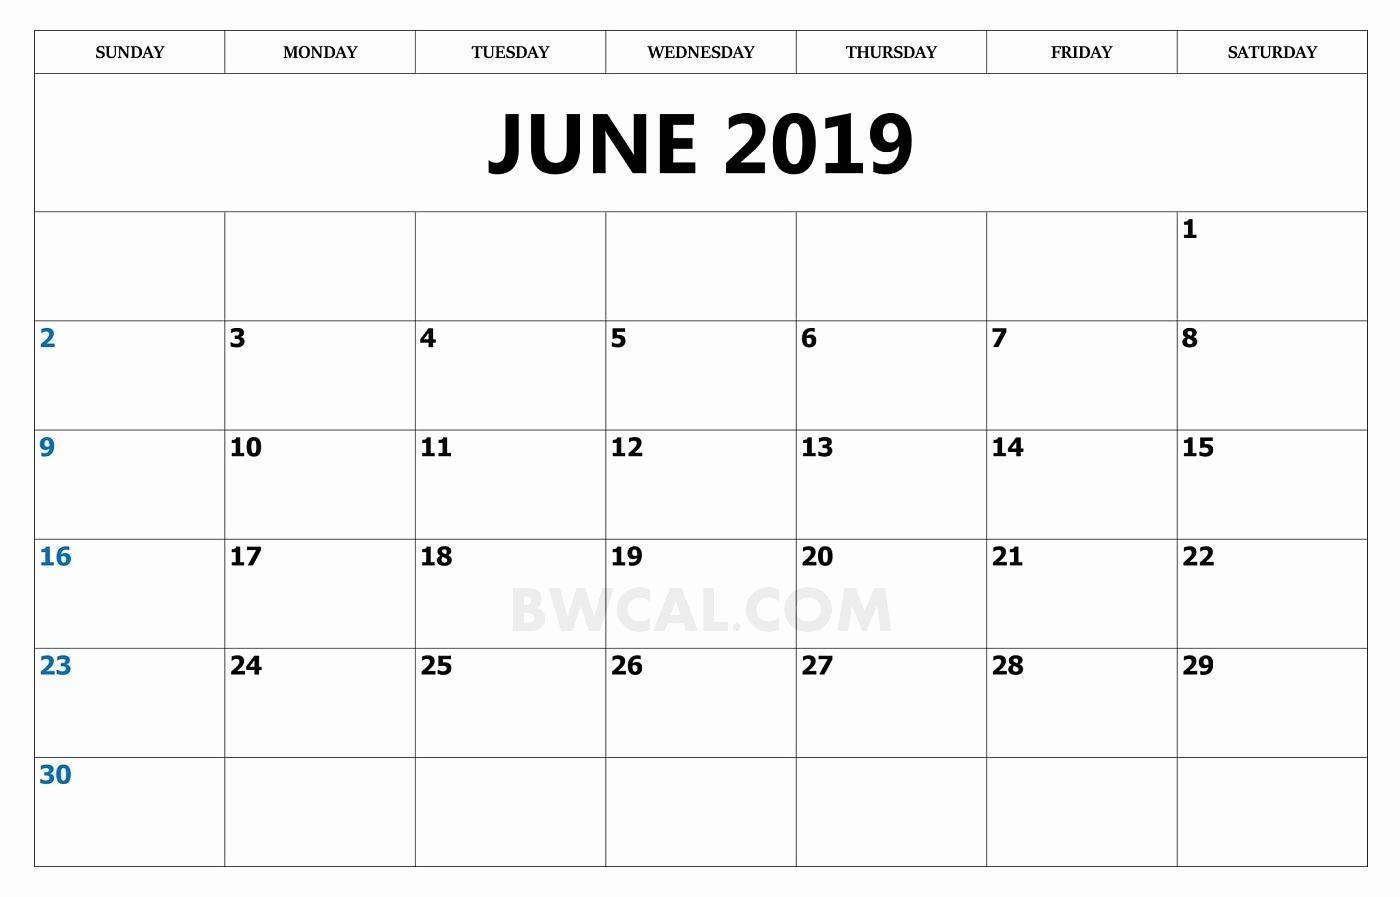 June 2019 Monthly Calendar Template